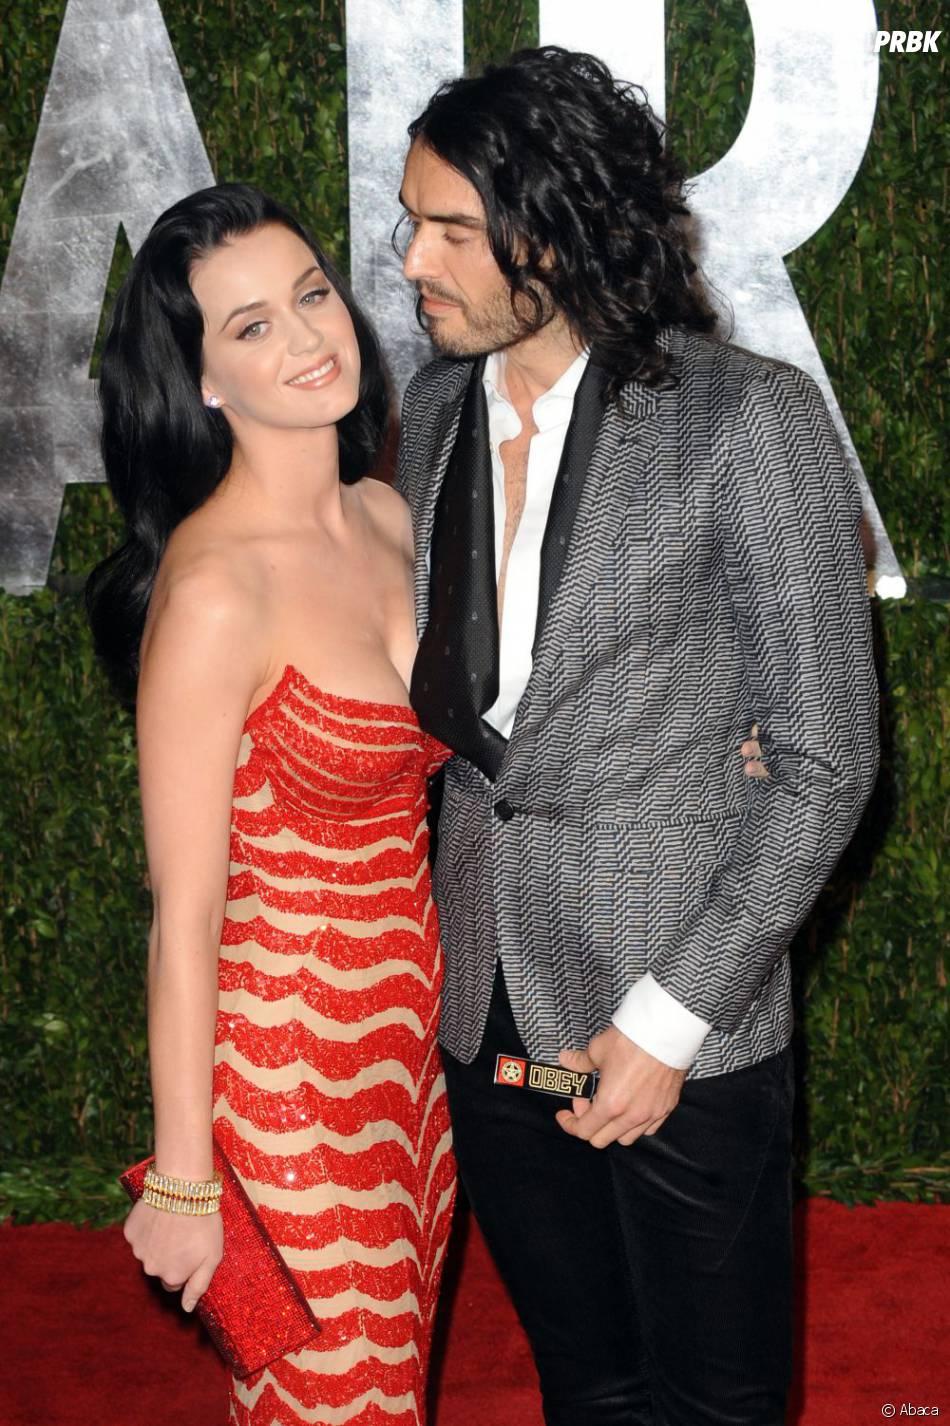 Katy Perry sera sexy sur le tapis rouge des Grammy Awards 2013